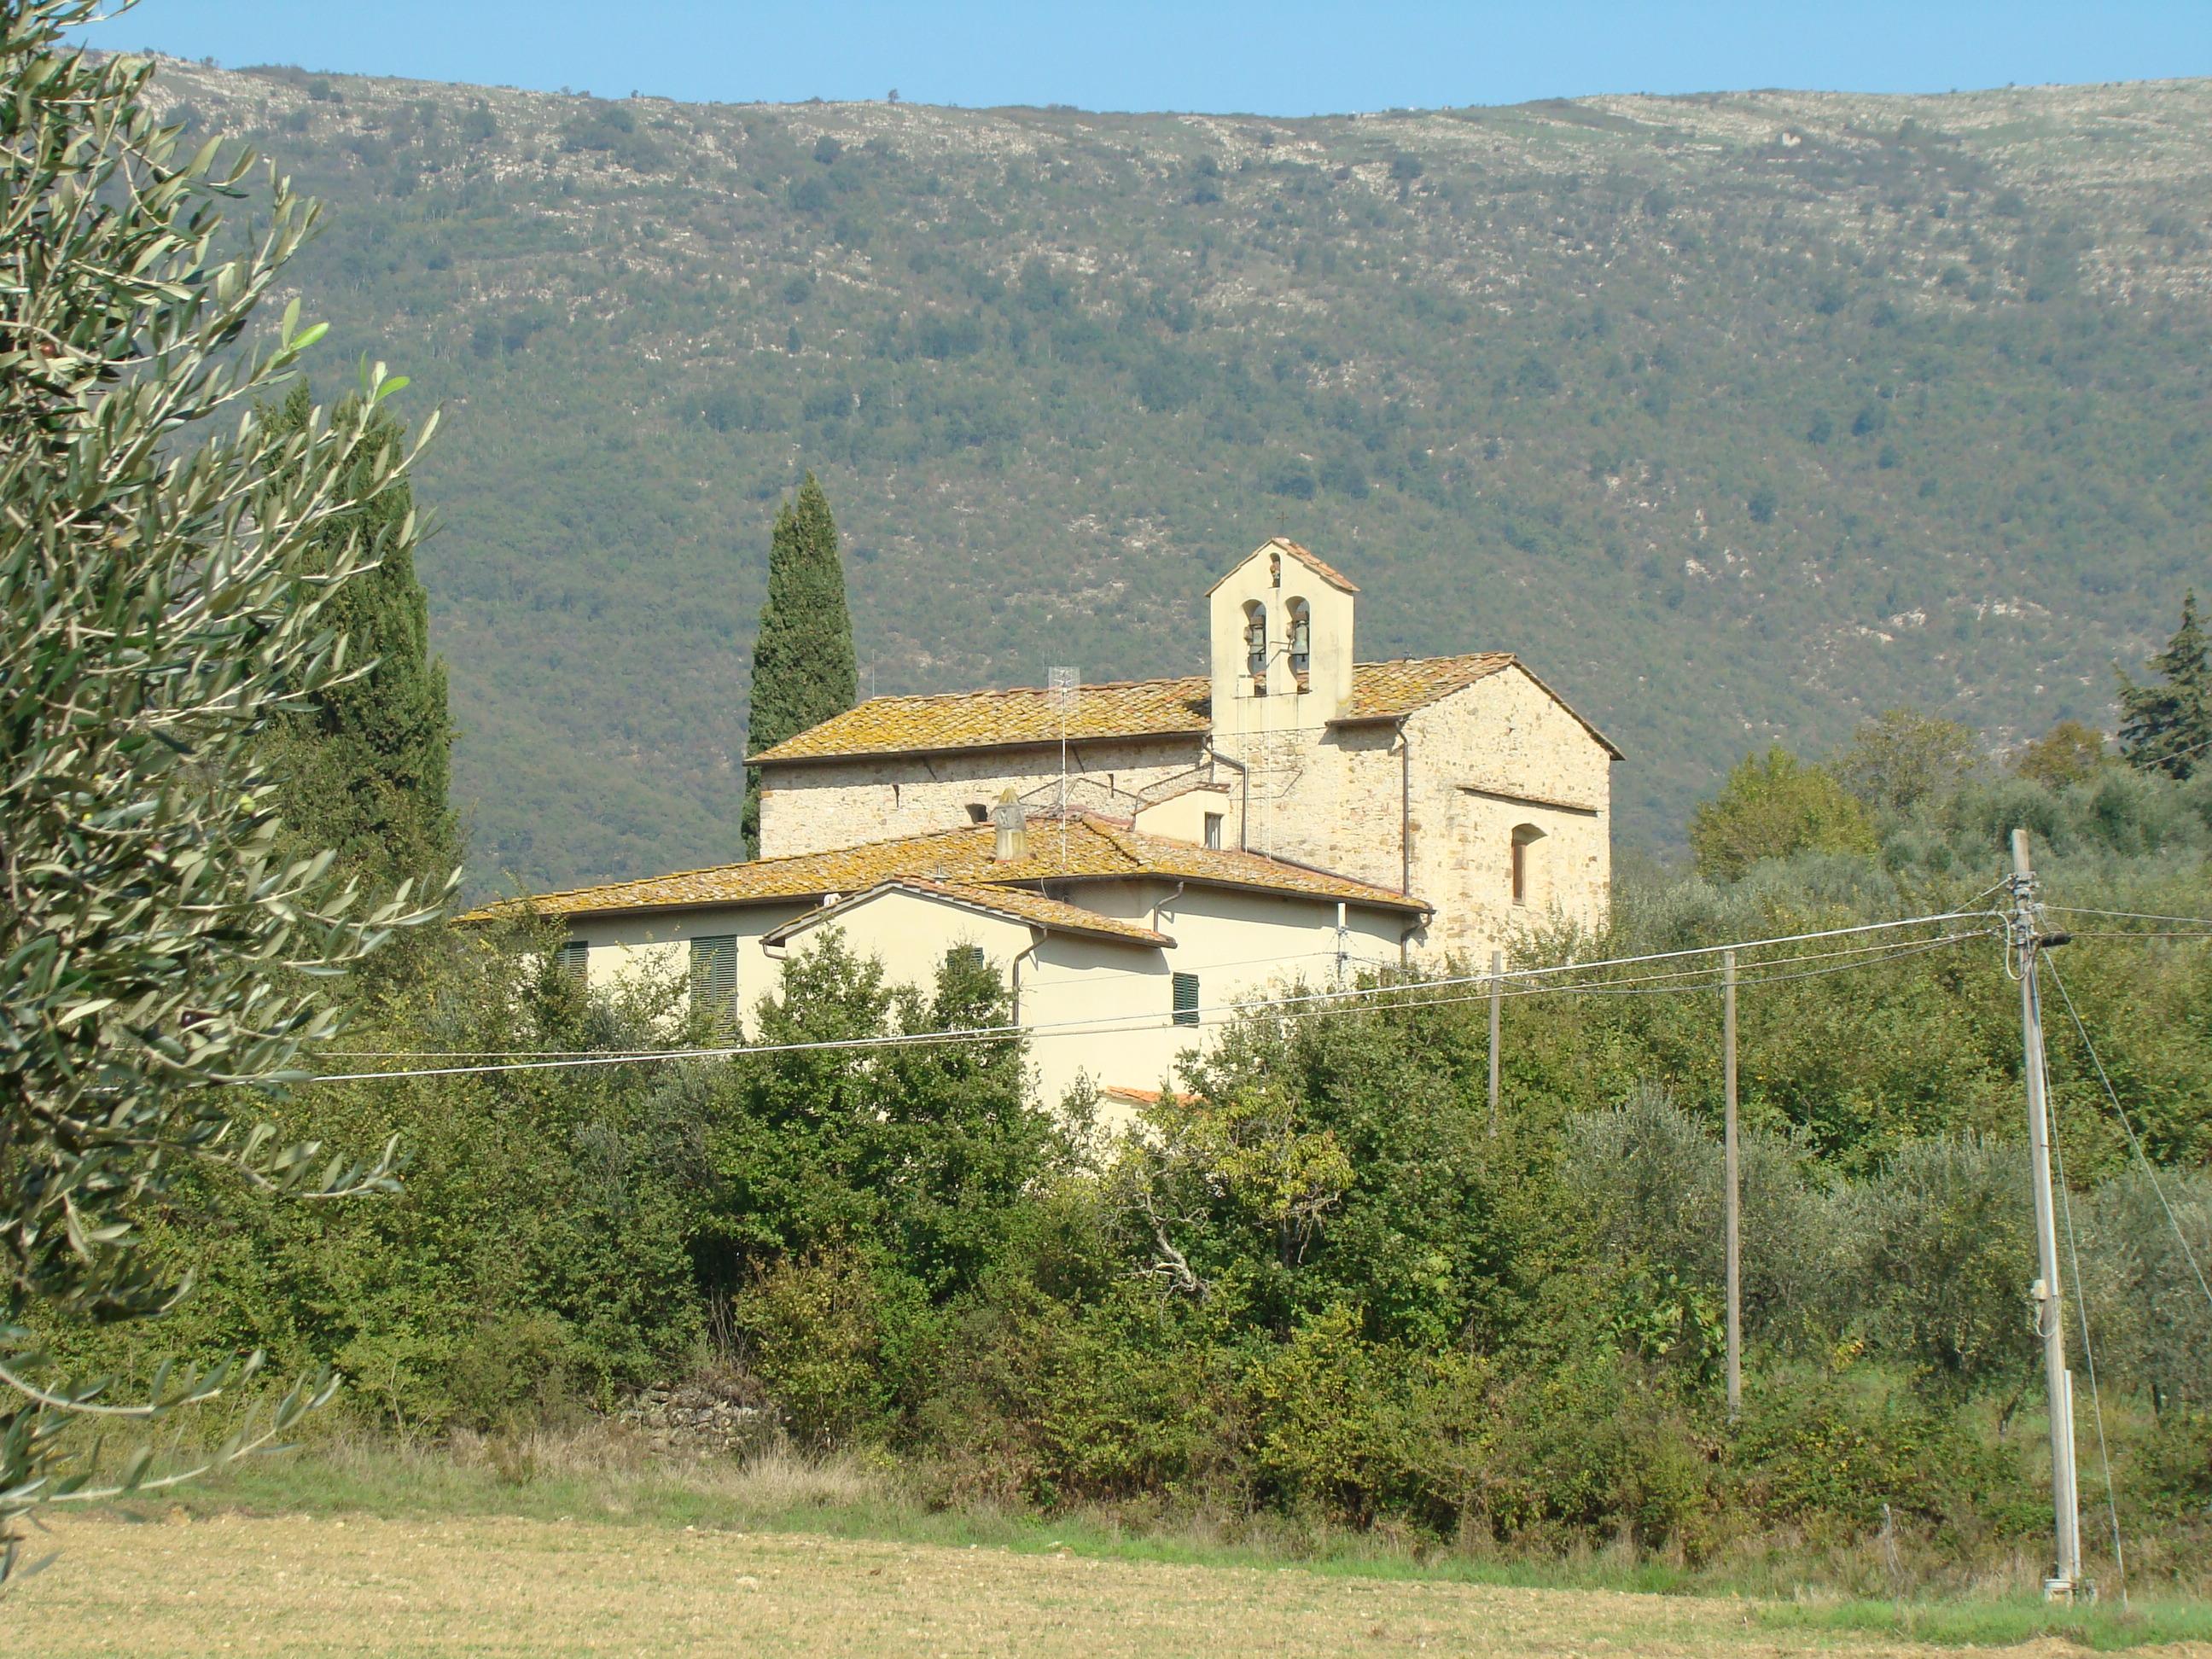 Chiesa di Santa Maria a Travalle (di Giuliana Profeti)